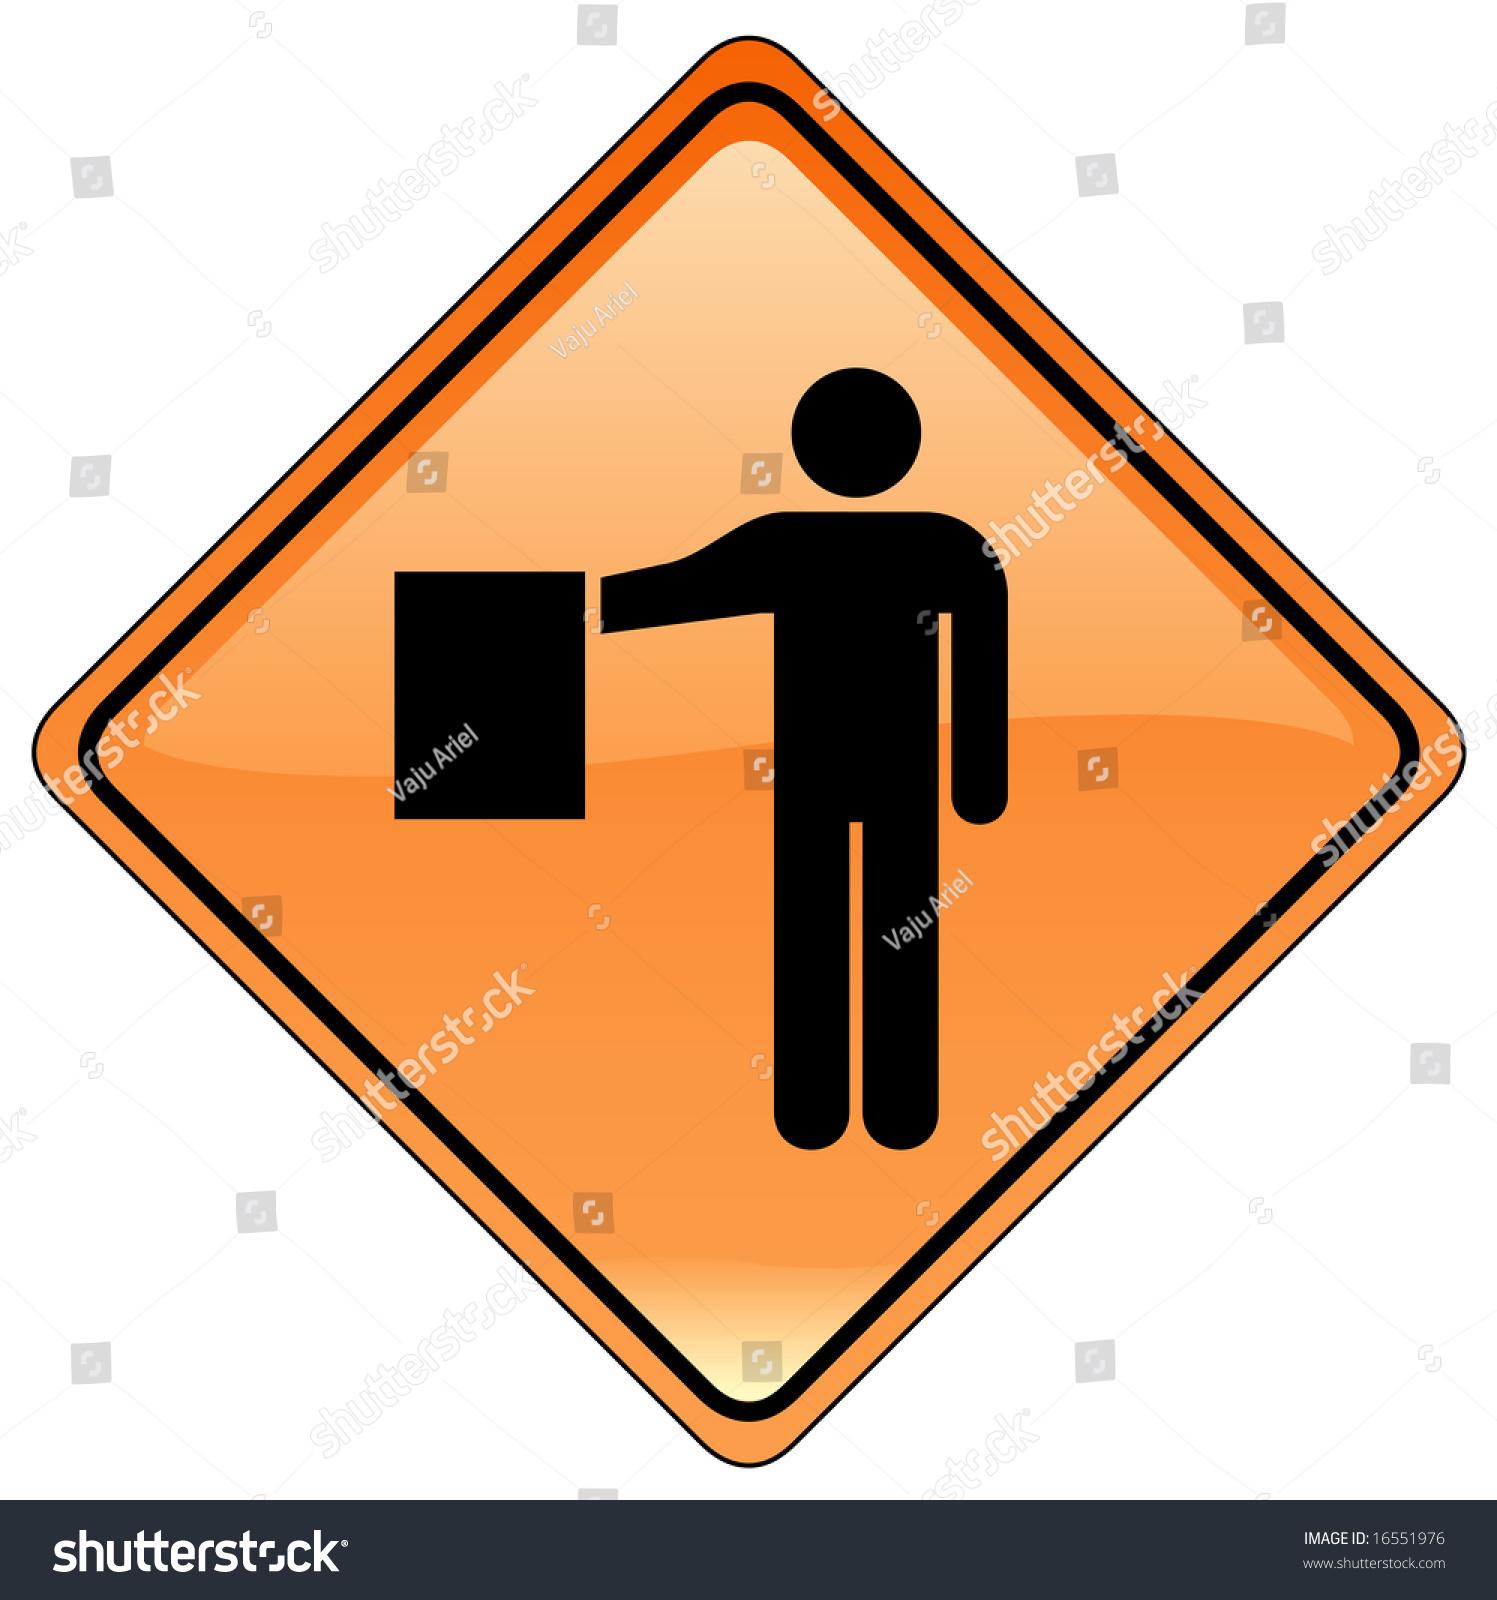 Individual Road Signs - Orange Stock Photo 16551976 ...